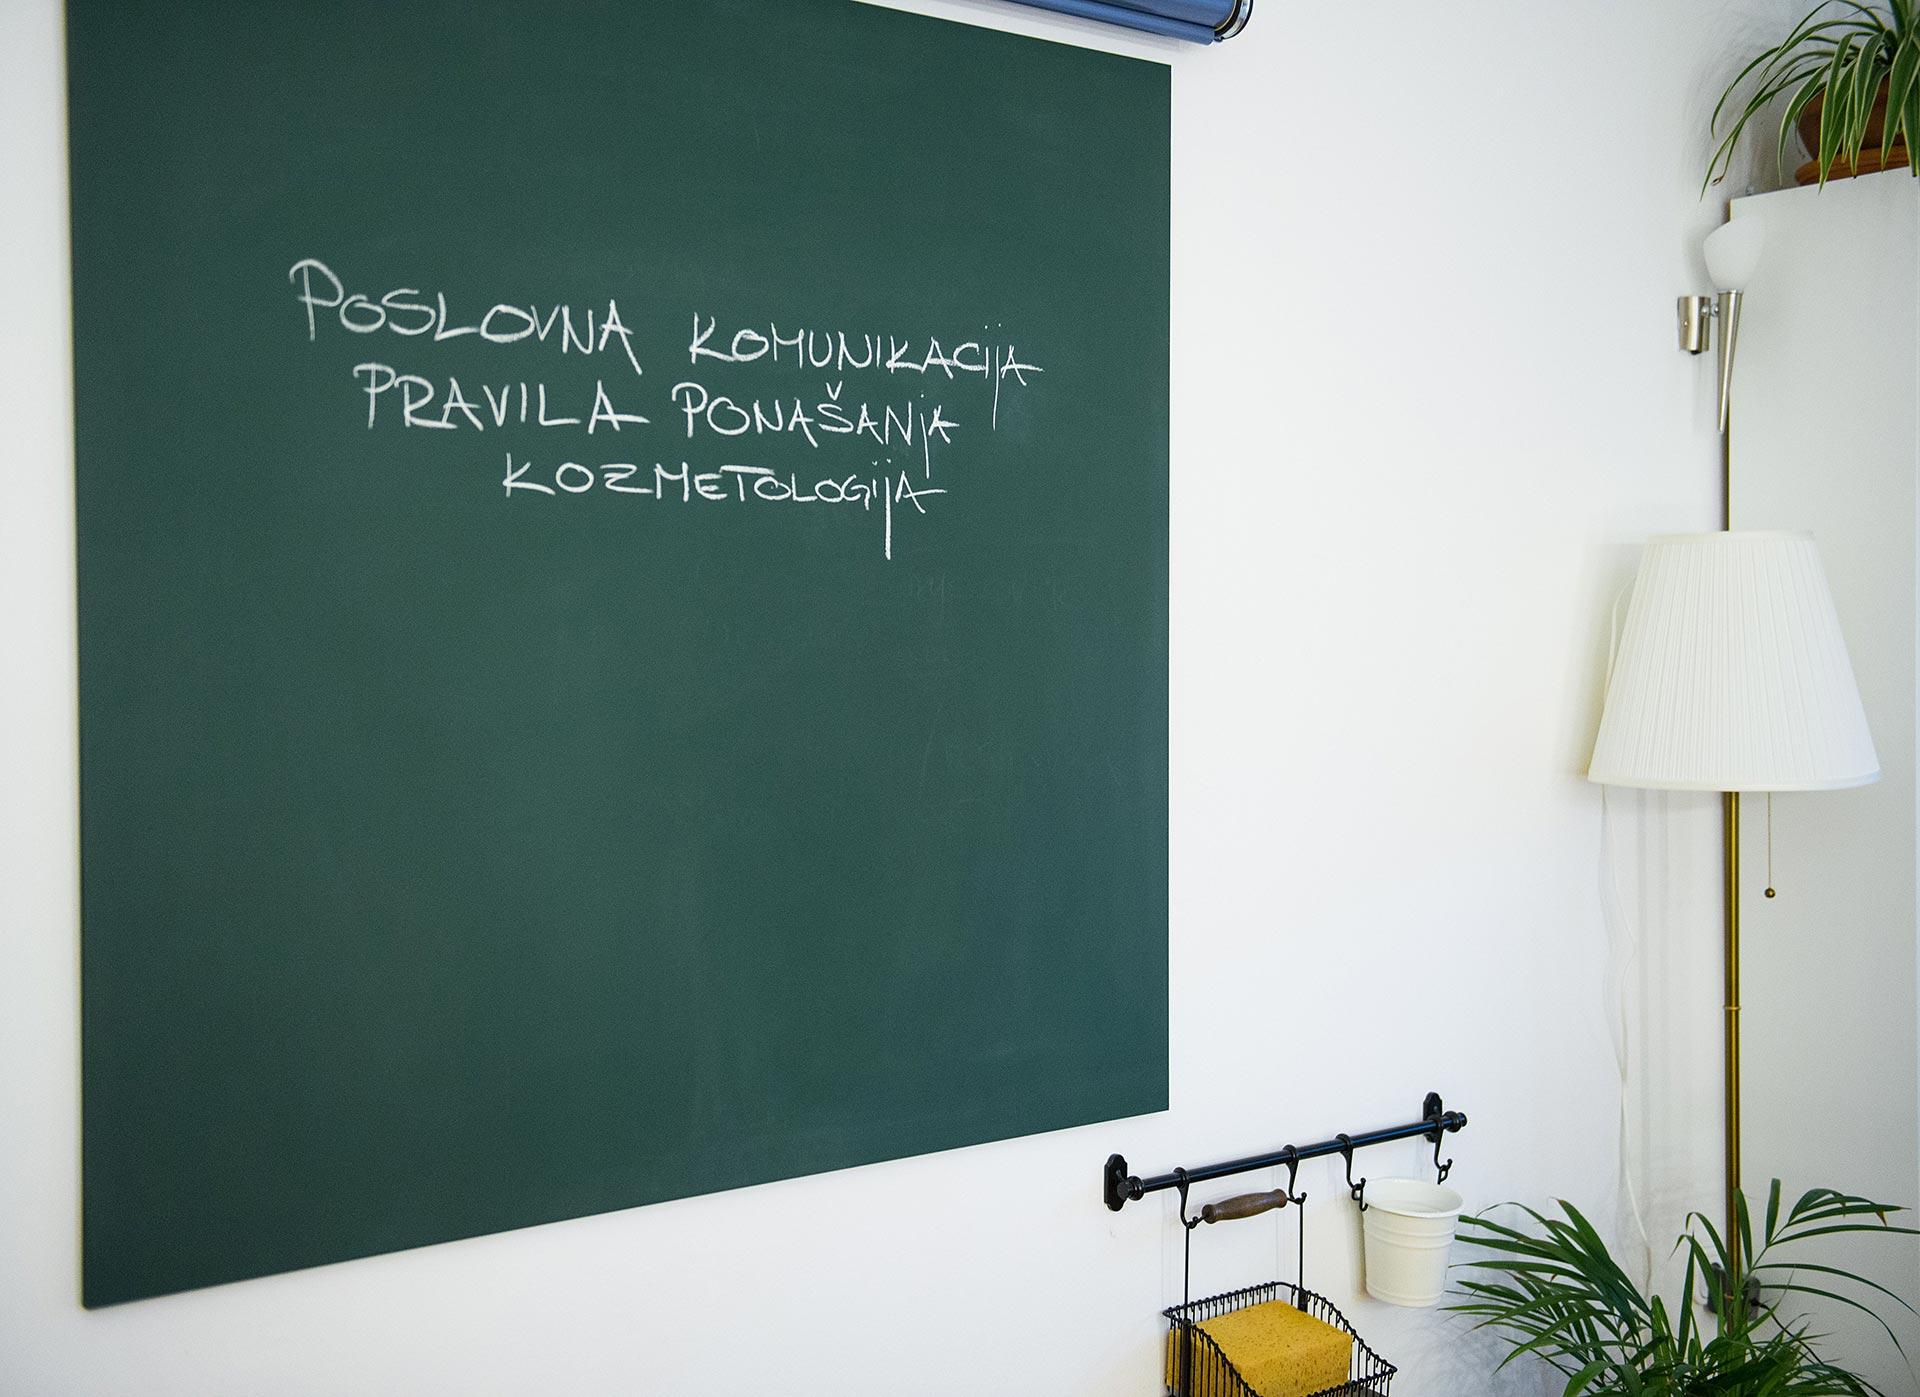 aoma-programi-3